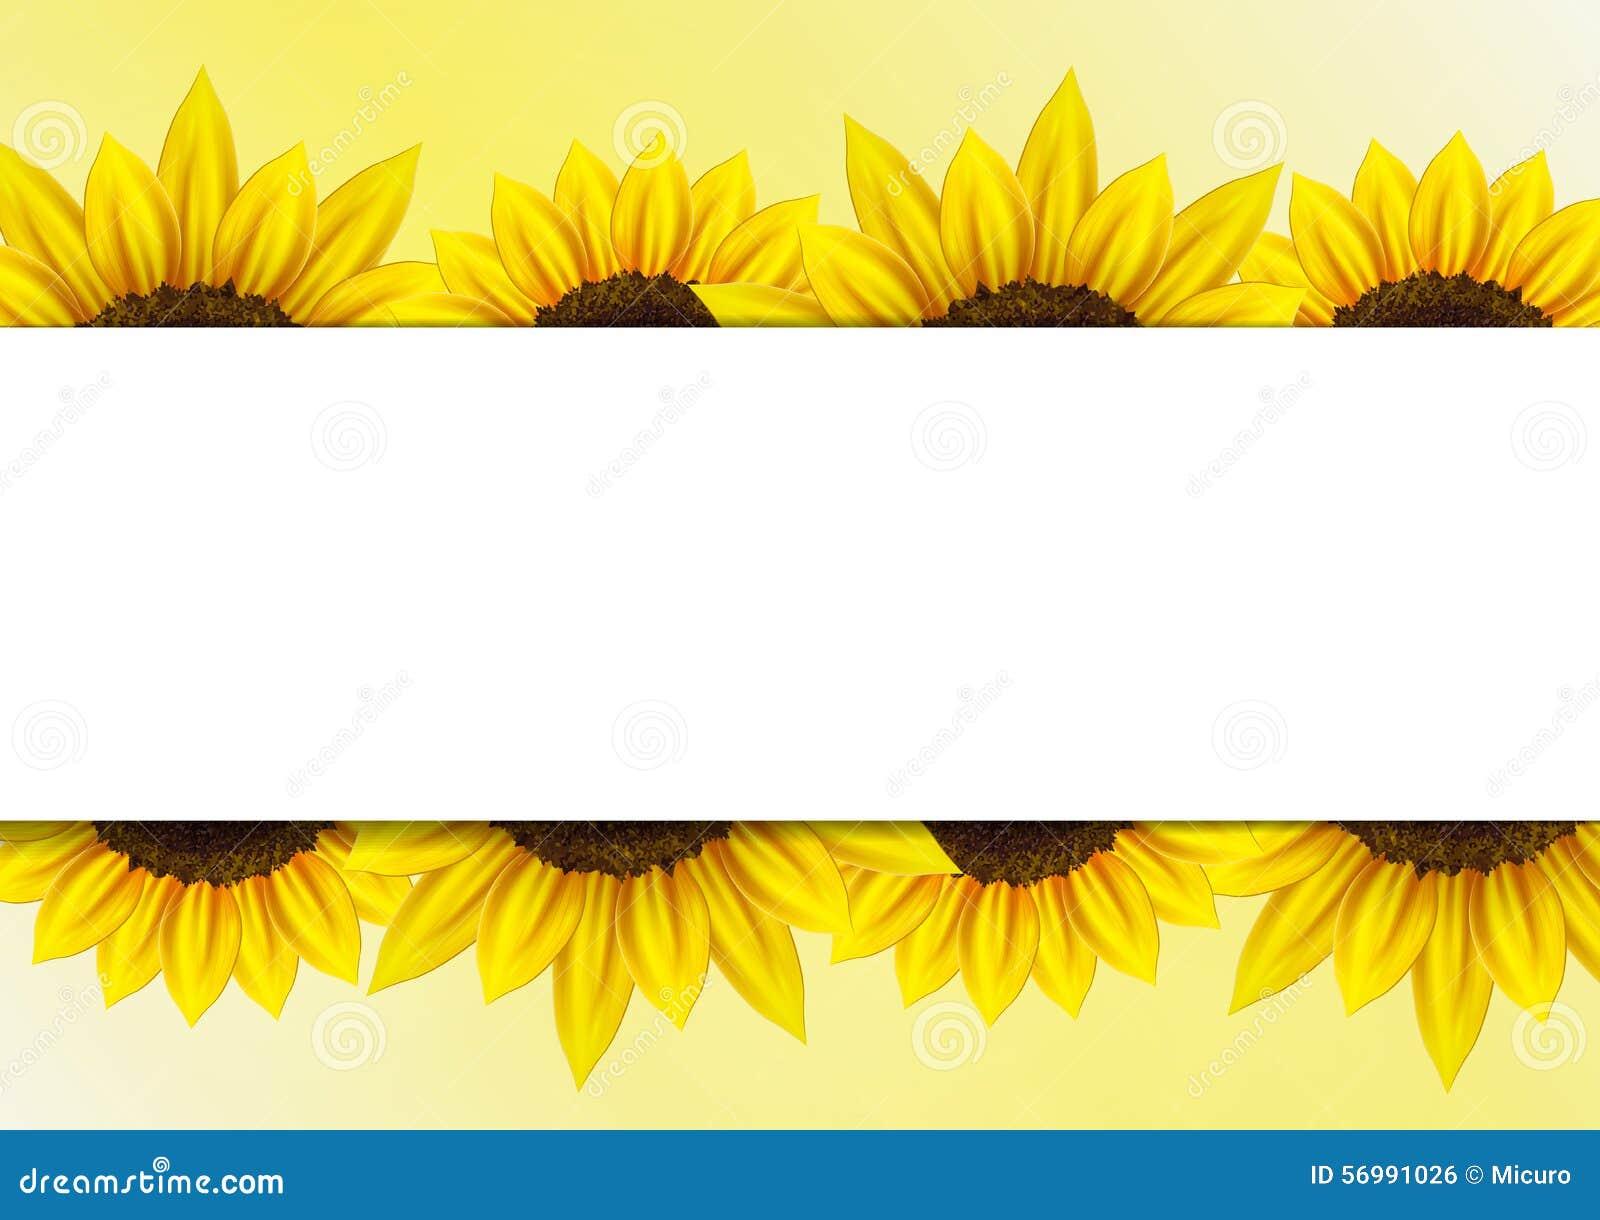 Sunflower Vector Background With Frame Stock Illustration Illustration Of September October 56991026